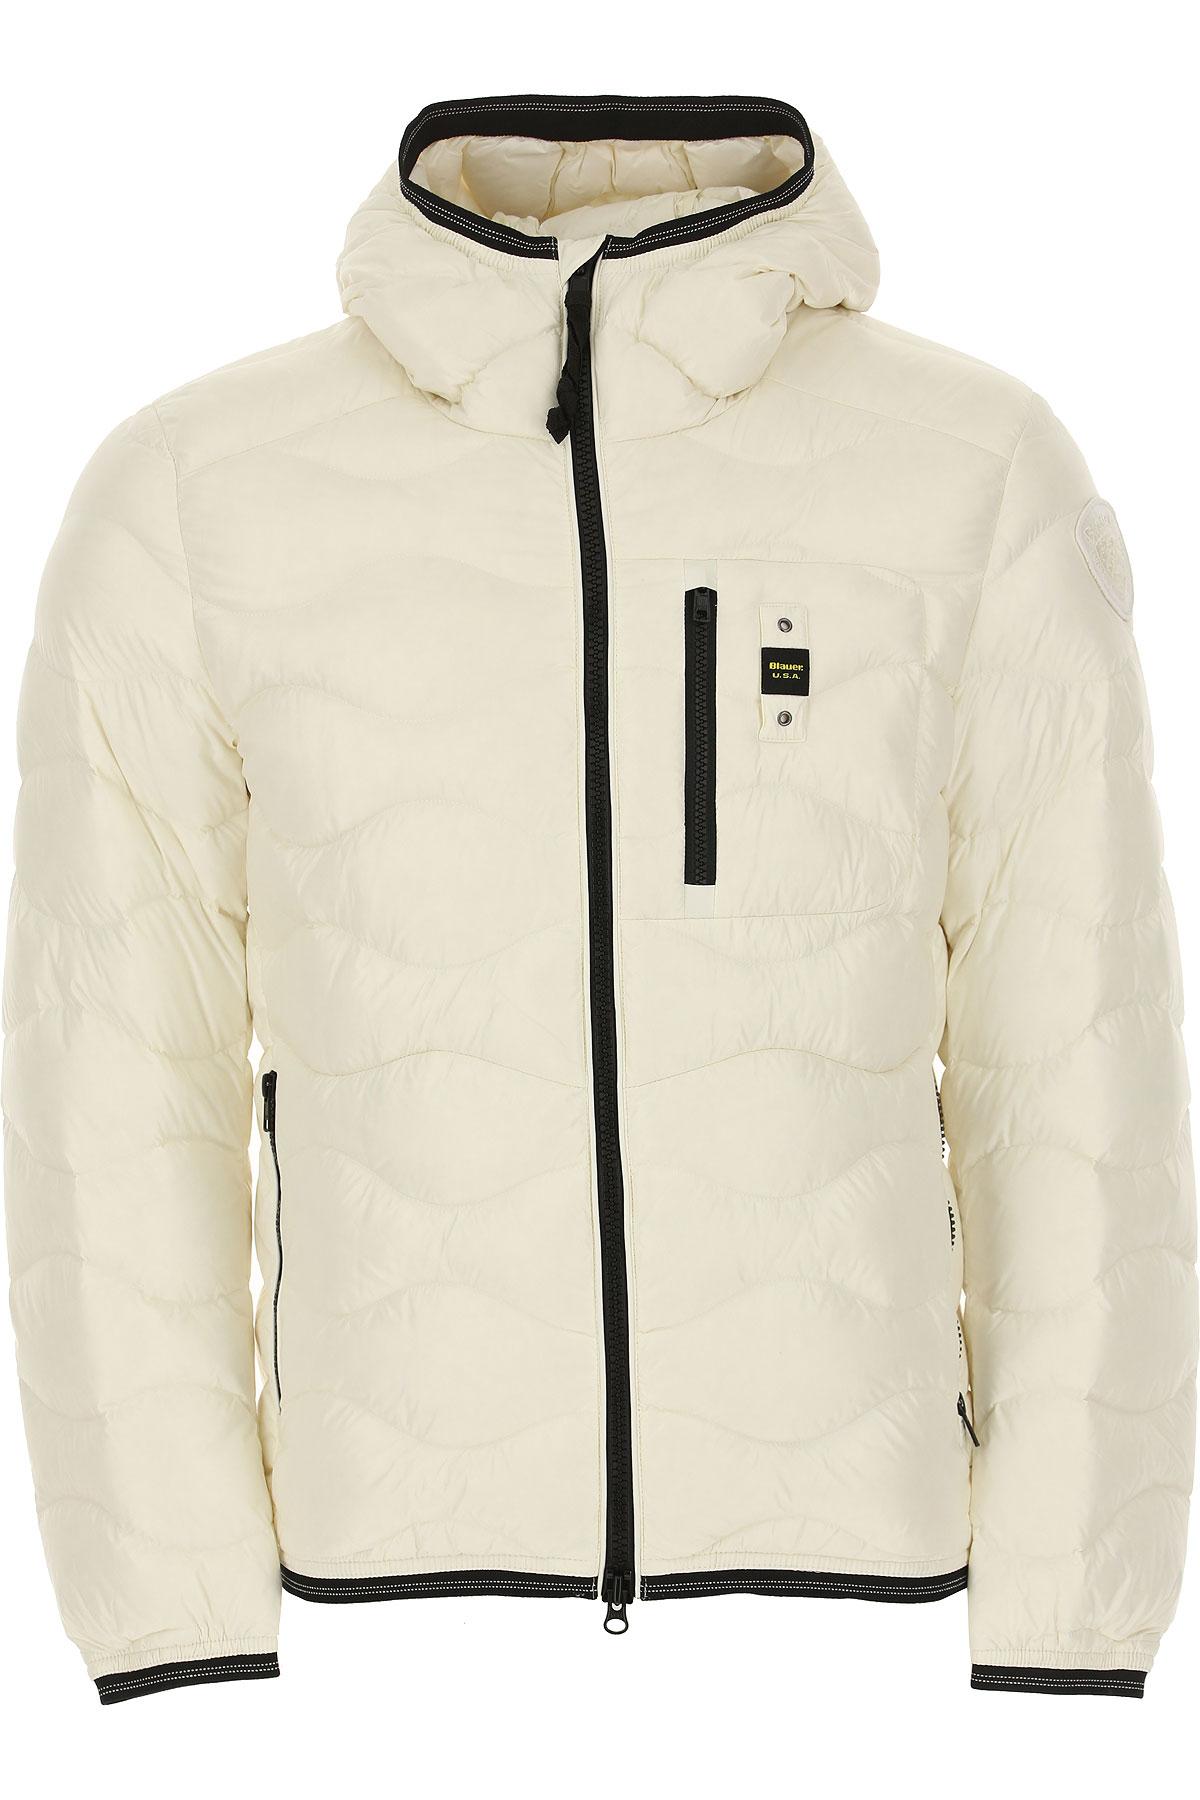 Blauer Down Jacket for Men, Puffer Ski Jacket On Sale, White, polyester, 2019, M XL